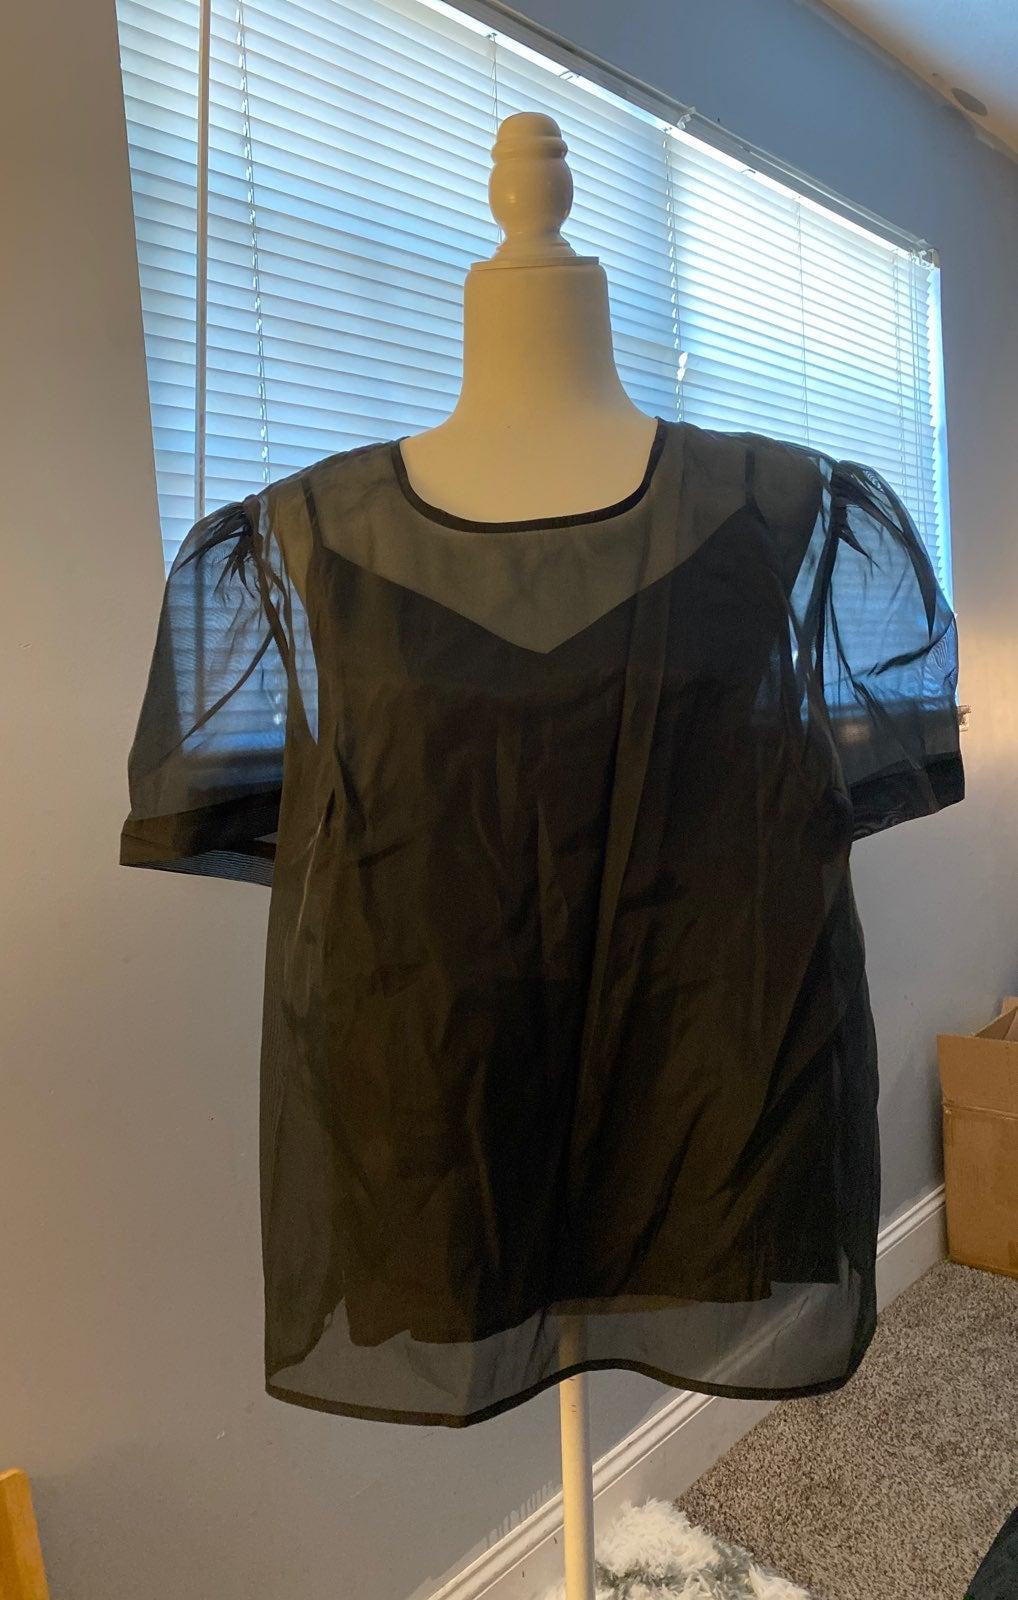 Puffy sleeve blouse